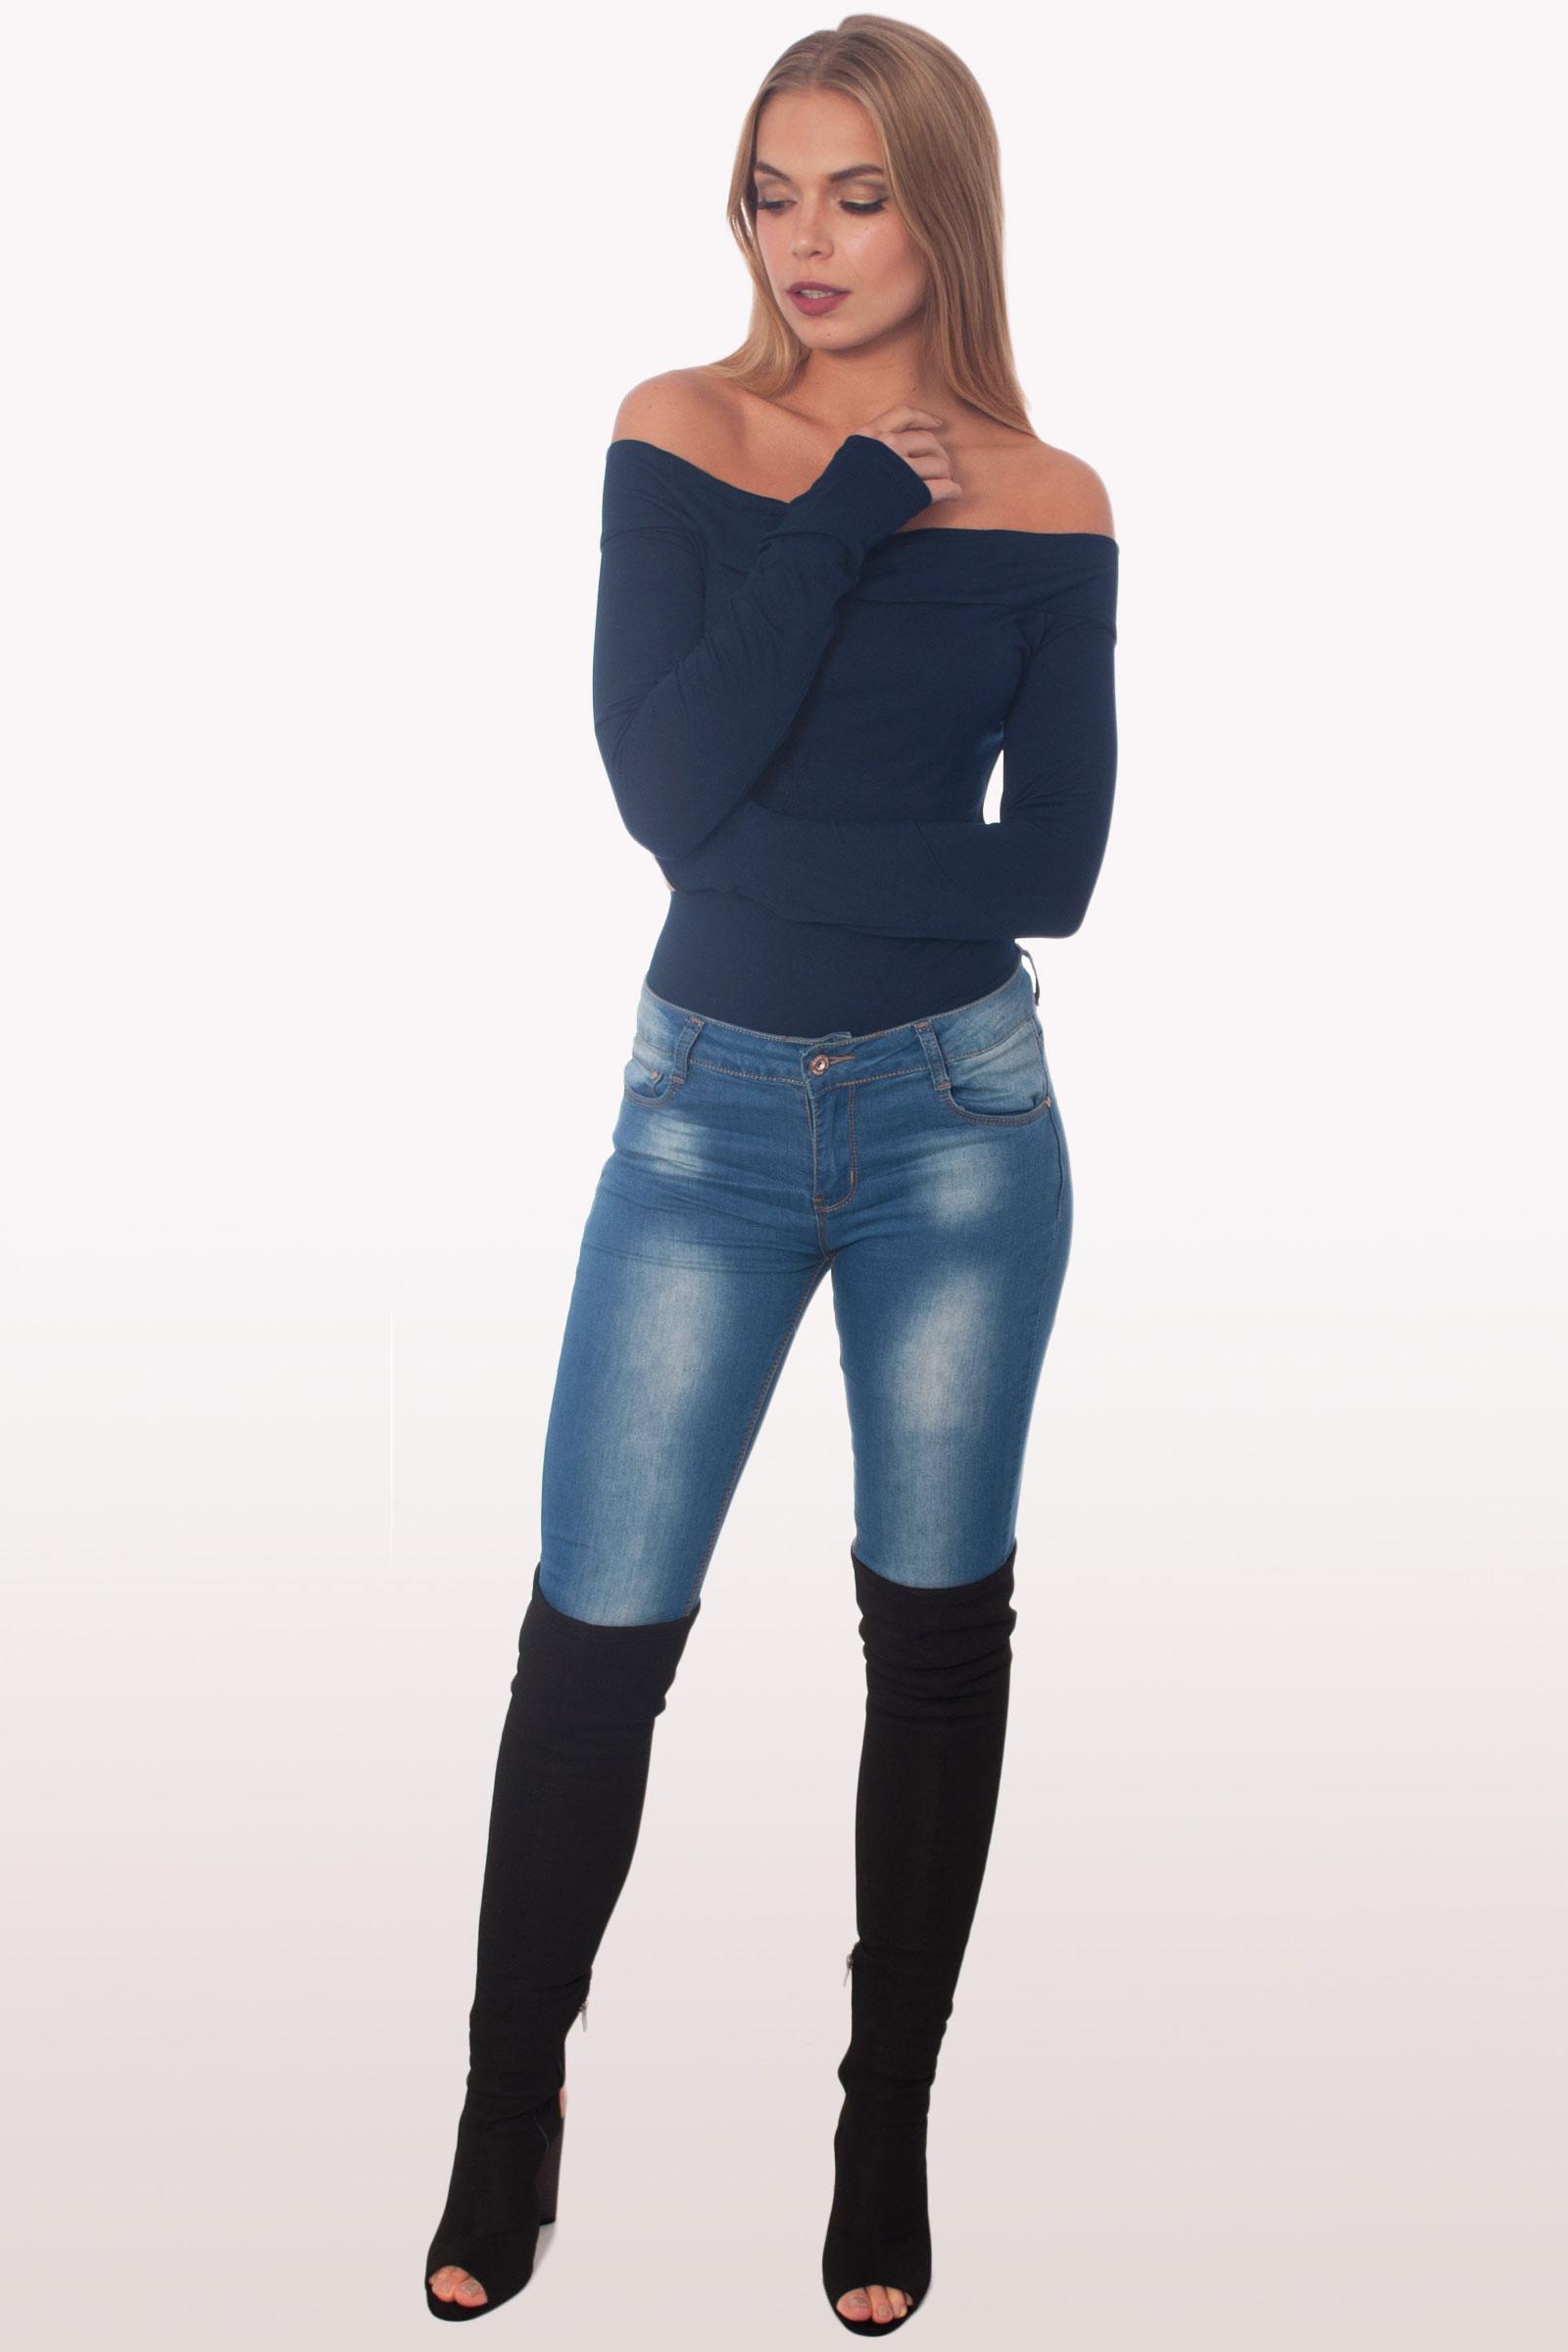 79caac01f5 Navy Bardot Long Sleeve Bodysuit |Bodysuits |Modamore